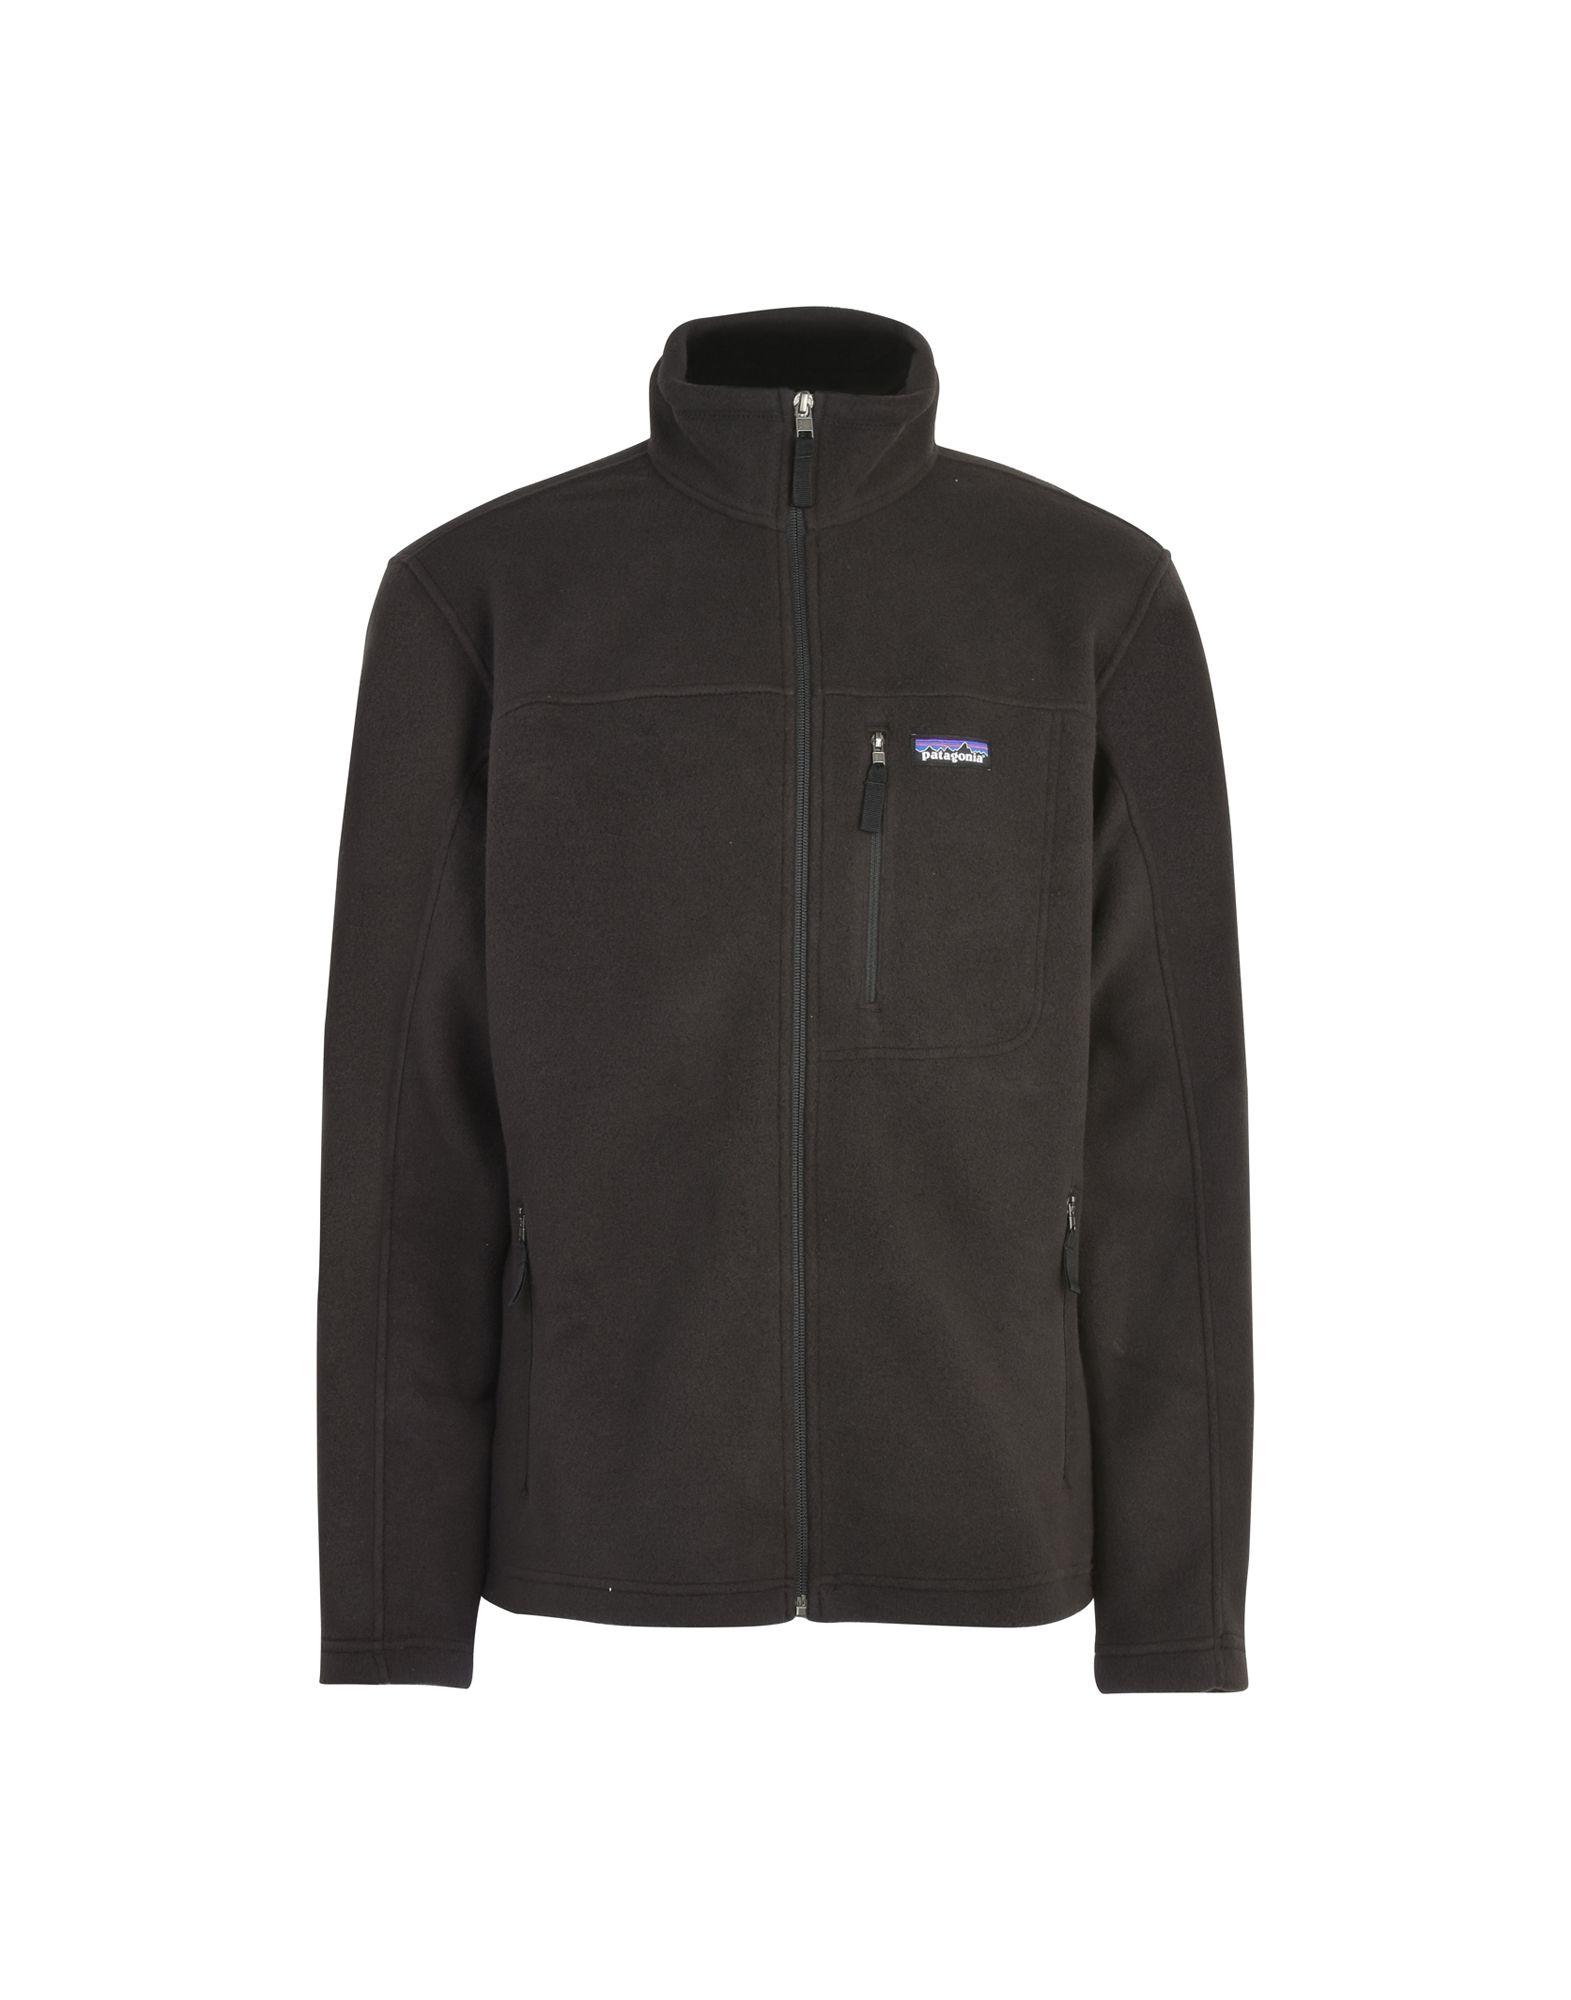 Felpa Patagonia Ms Classic Synchilla Jacket - Uomo - Acquista online su